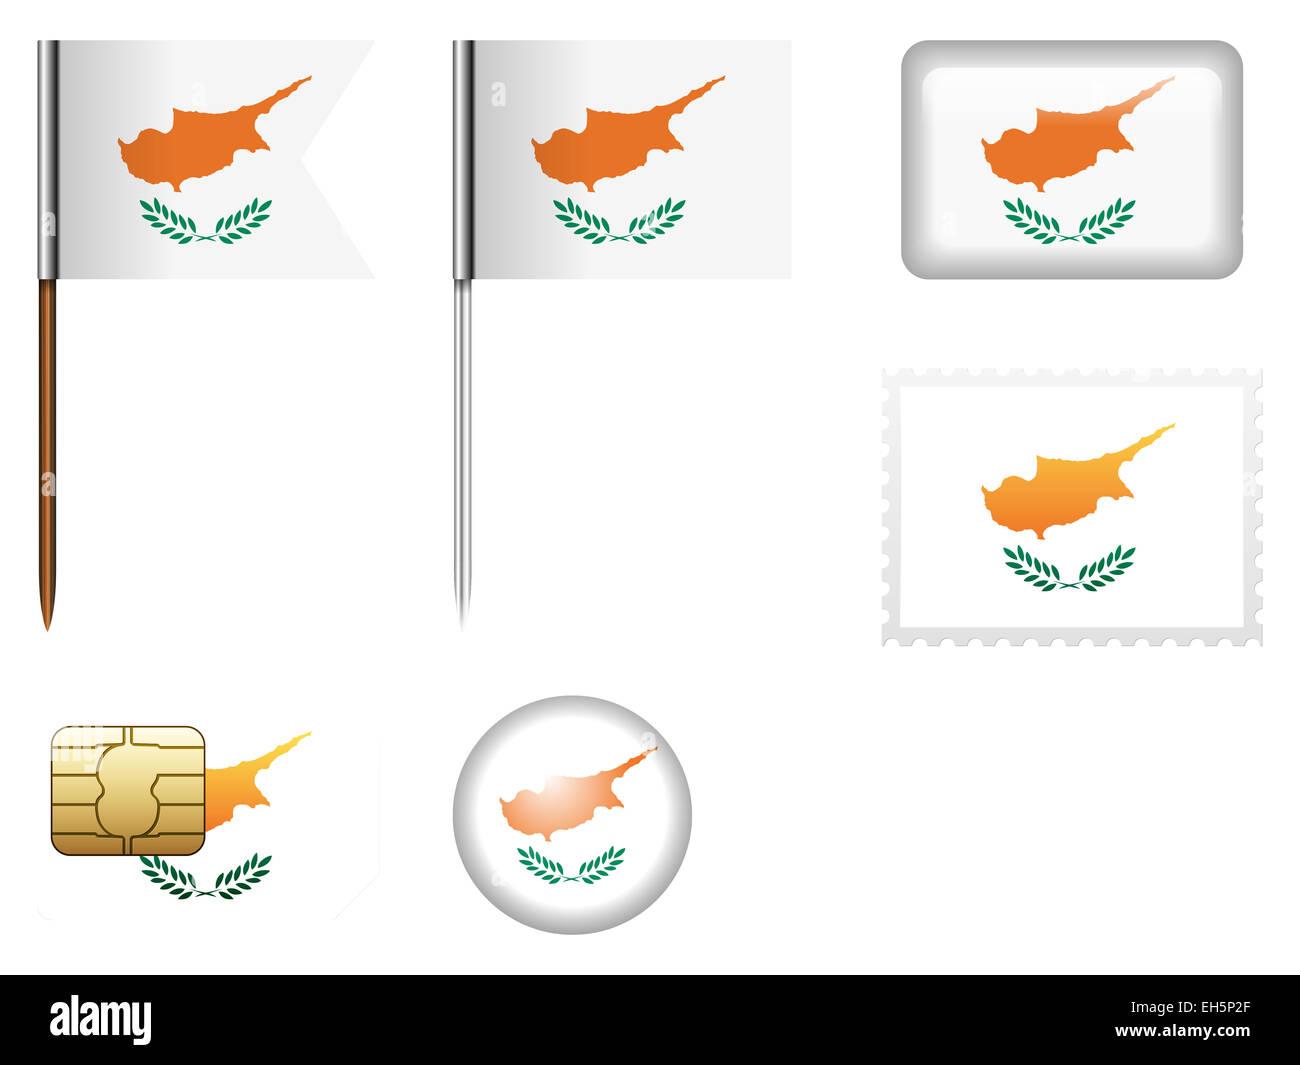 Cyprus flag set on a white background. - Stock Image